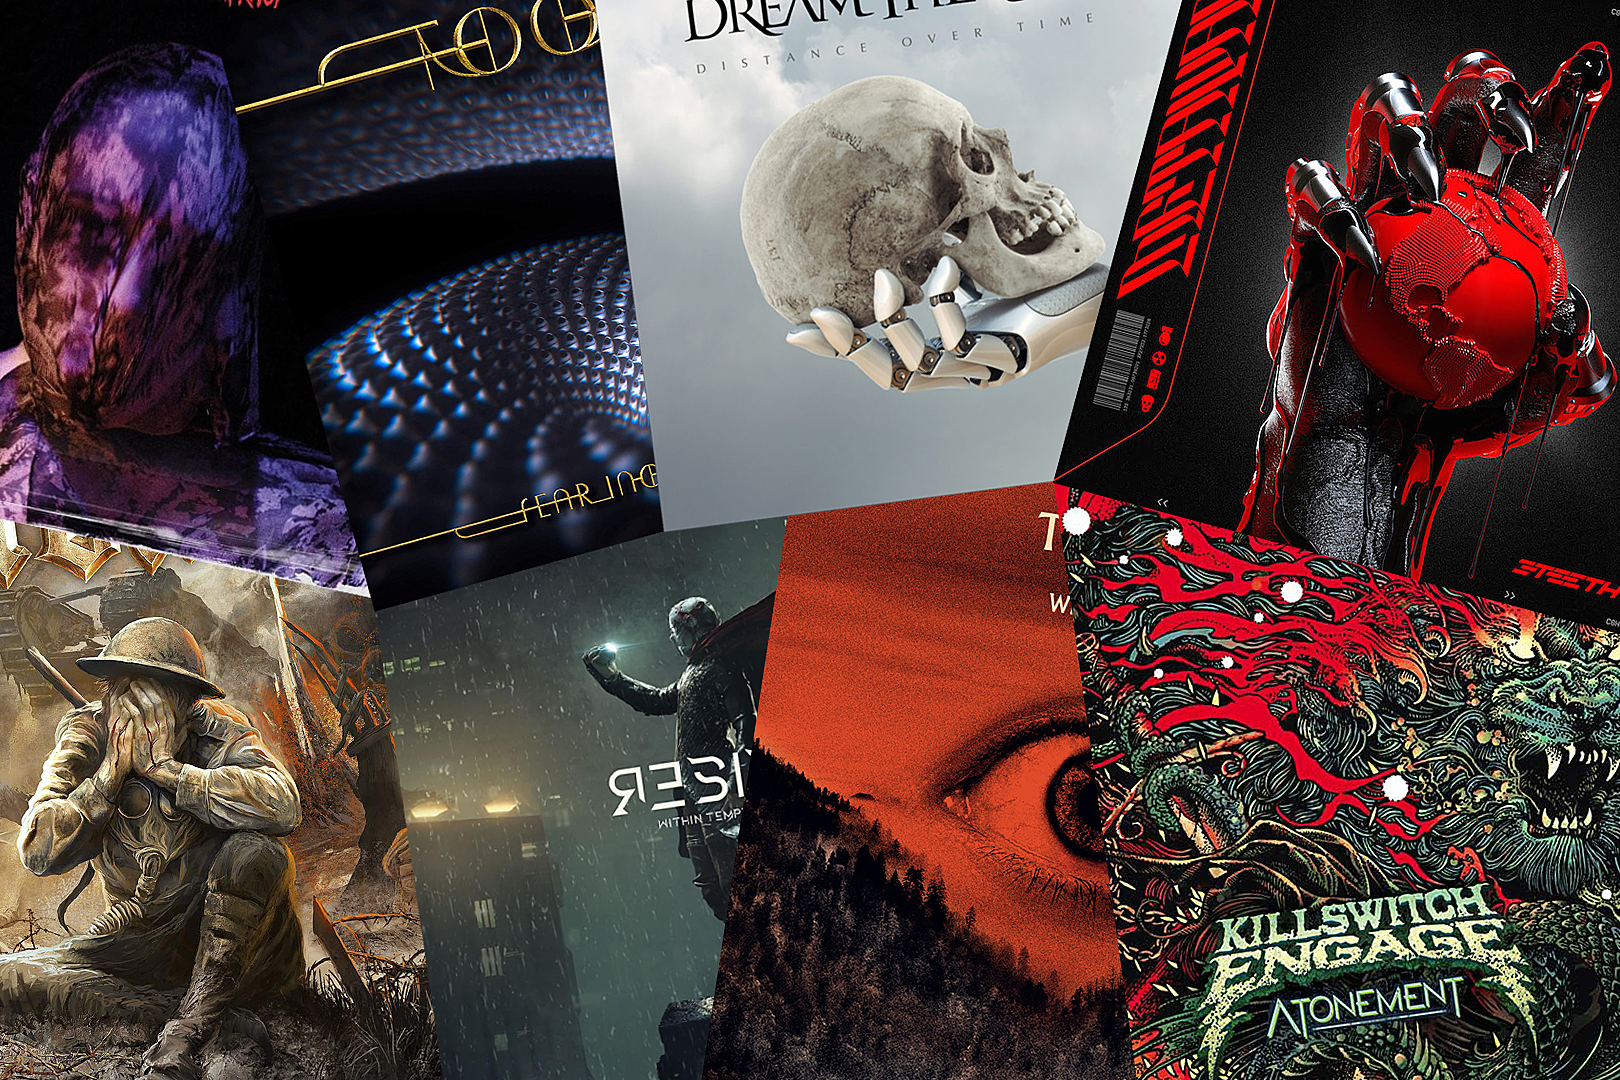 Best Metal Albums Of 2020.The 50 Best Metal Albums Of 2019